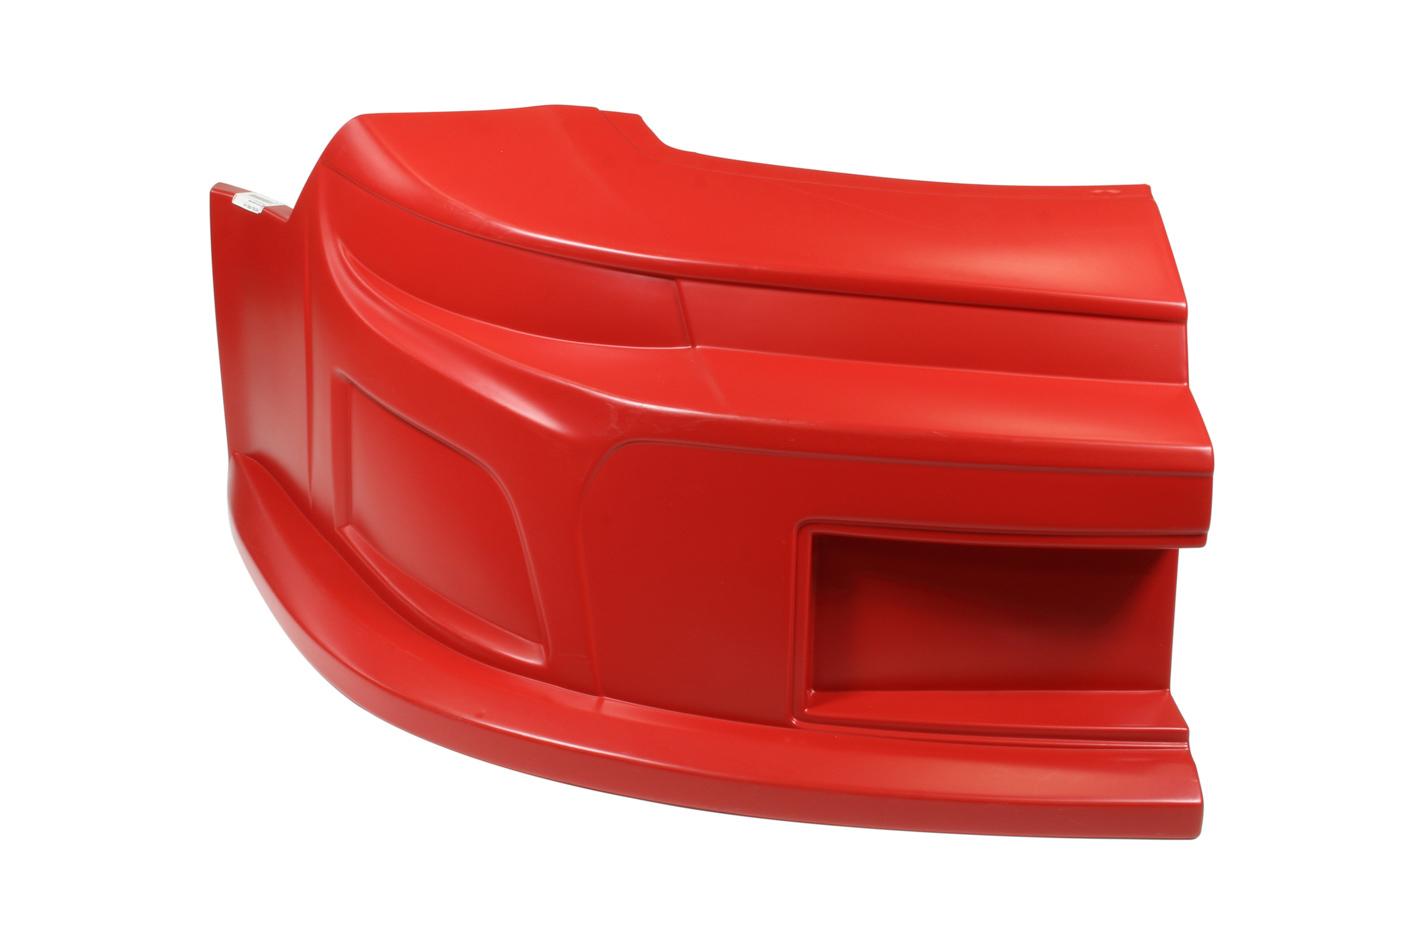 FIVESTAR 2019 LM Camaro Nose Plastic Red Right P/N -11132-41051-RR